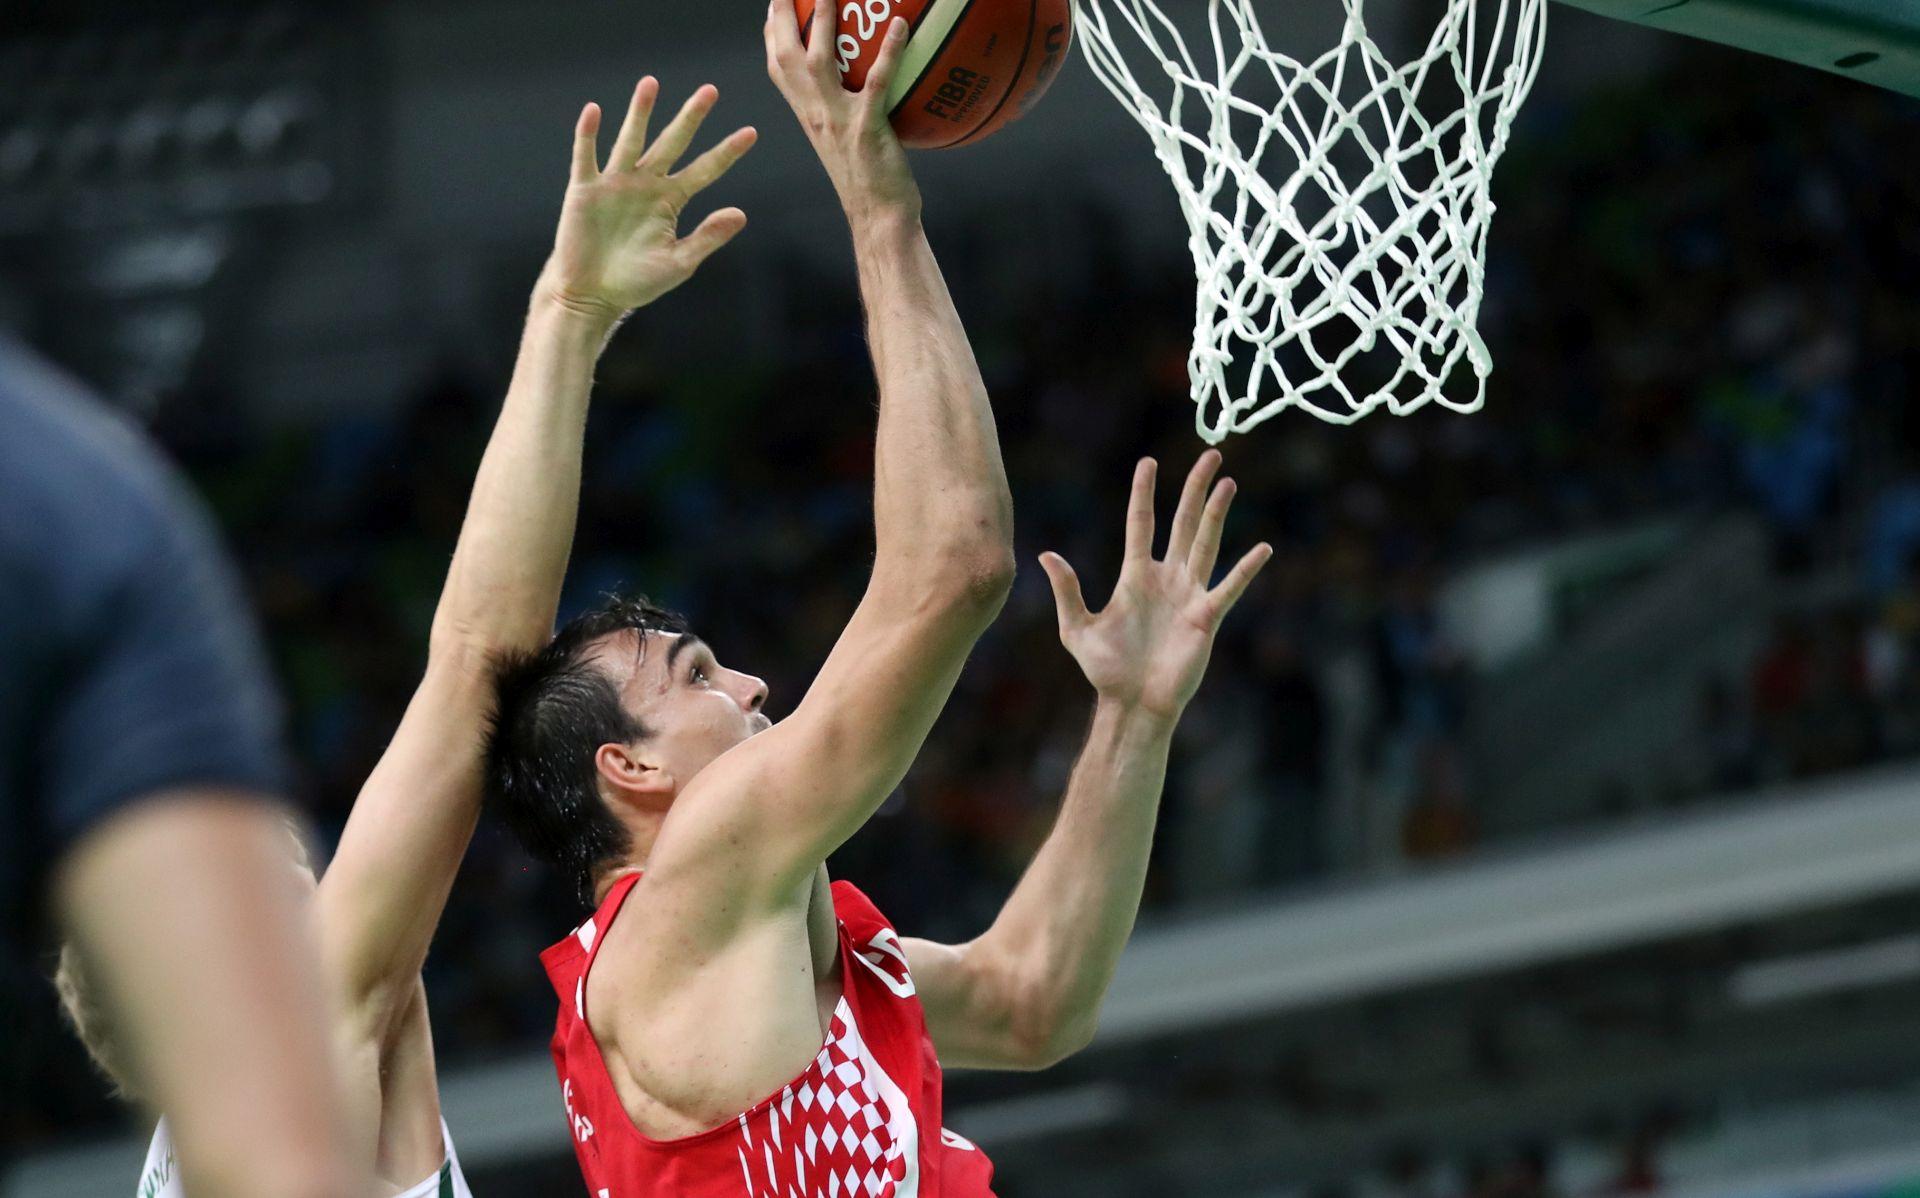 NBA: Šarićev drugi double-double i druga pobjeda 76ersa